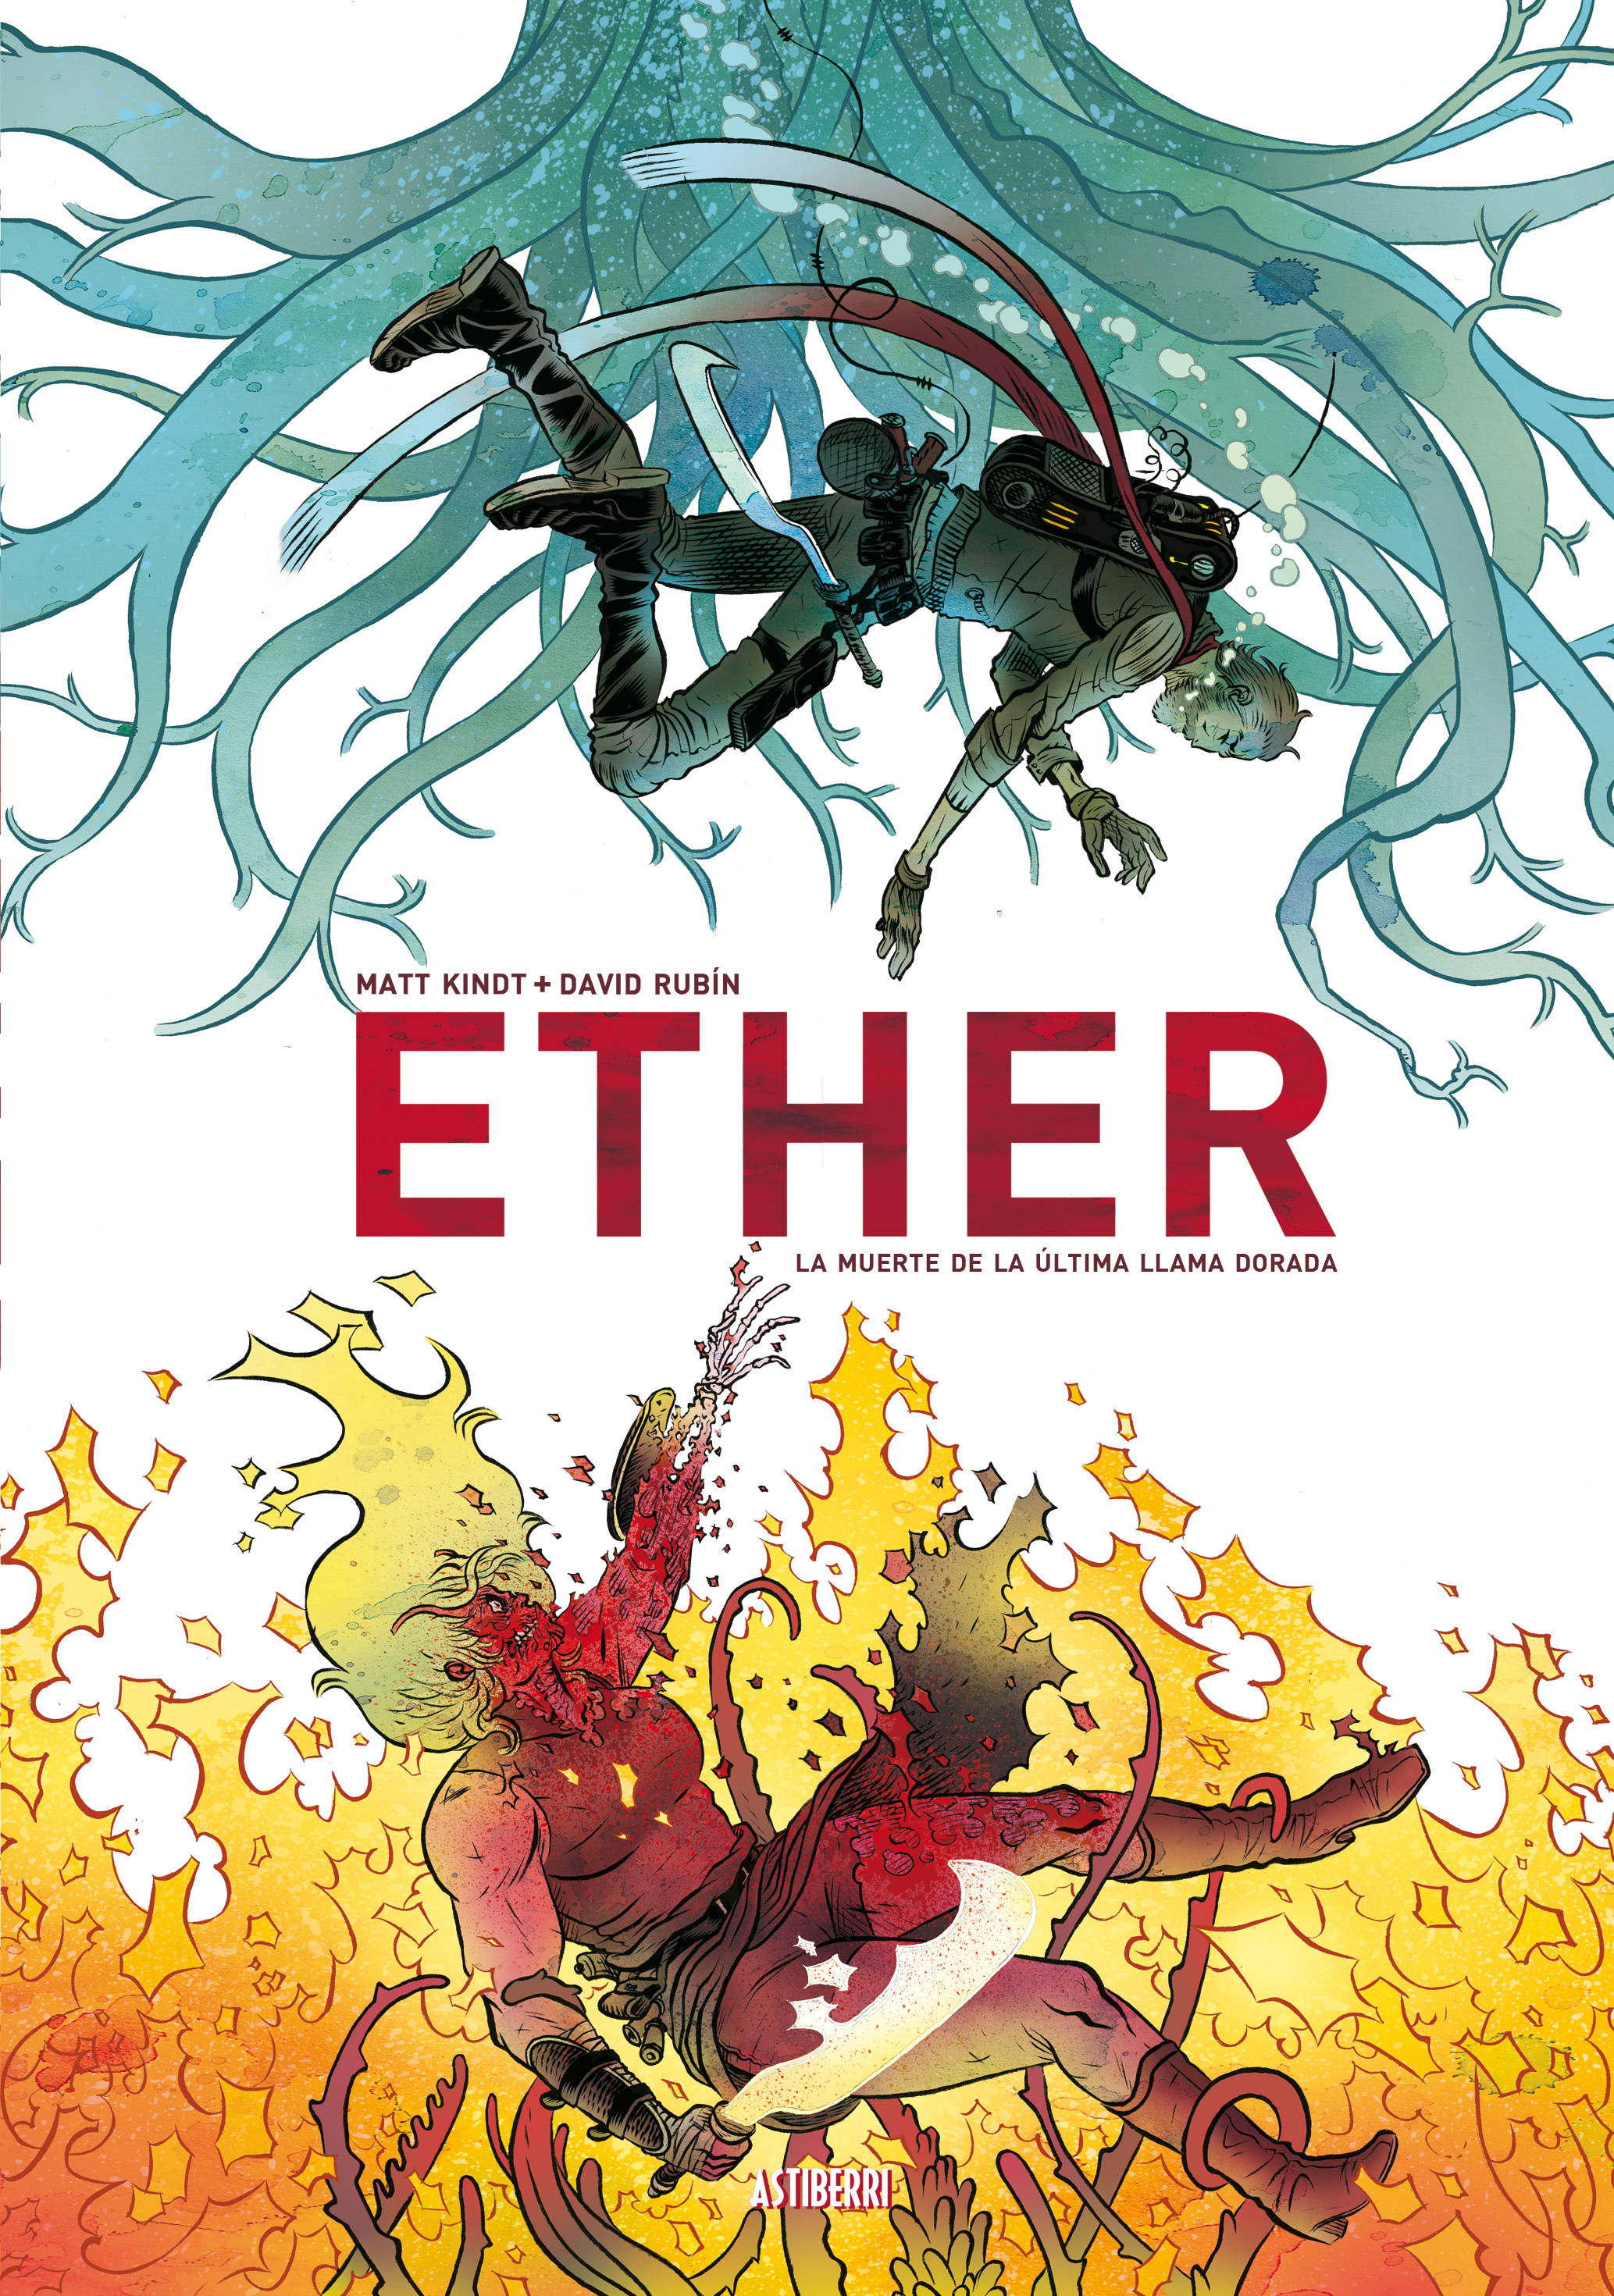 Astiberri publicará o <i>Ether</i> de Rubín en castelán